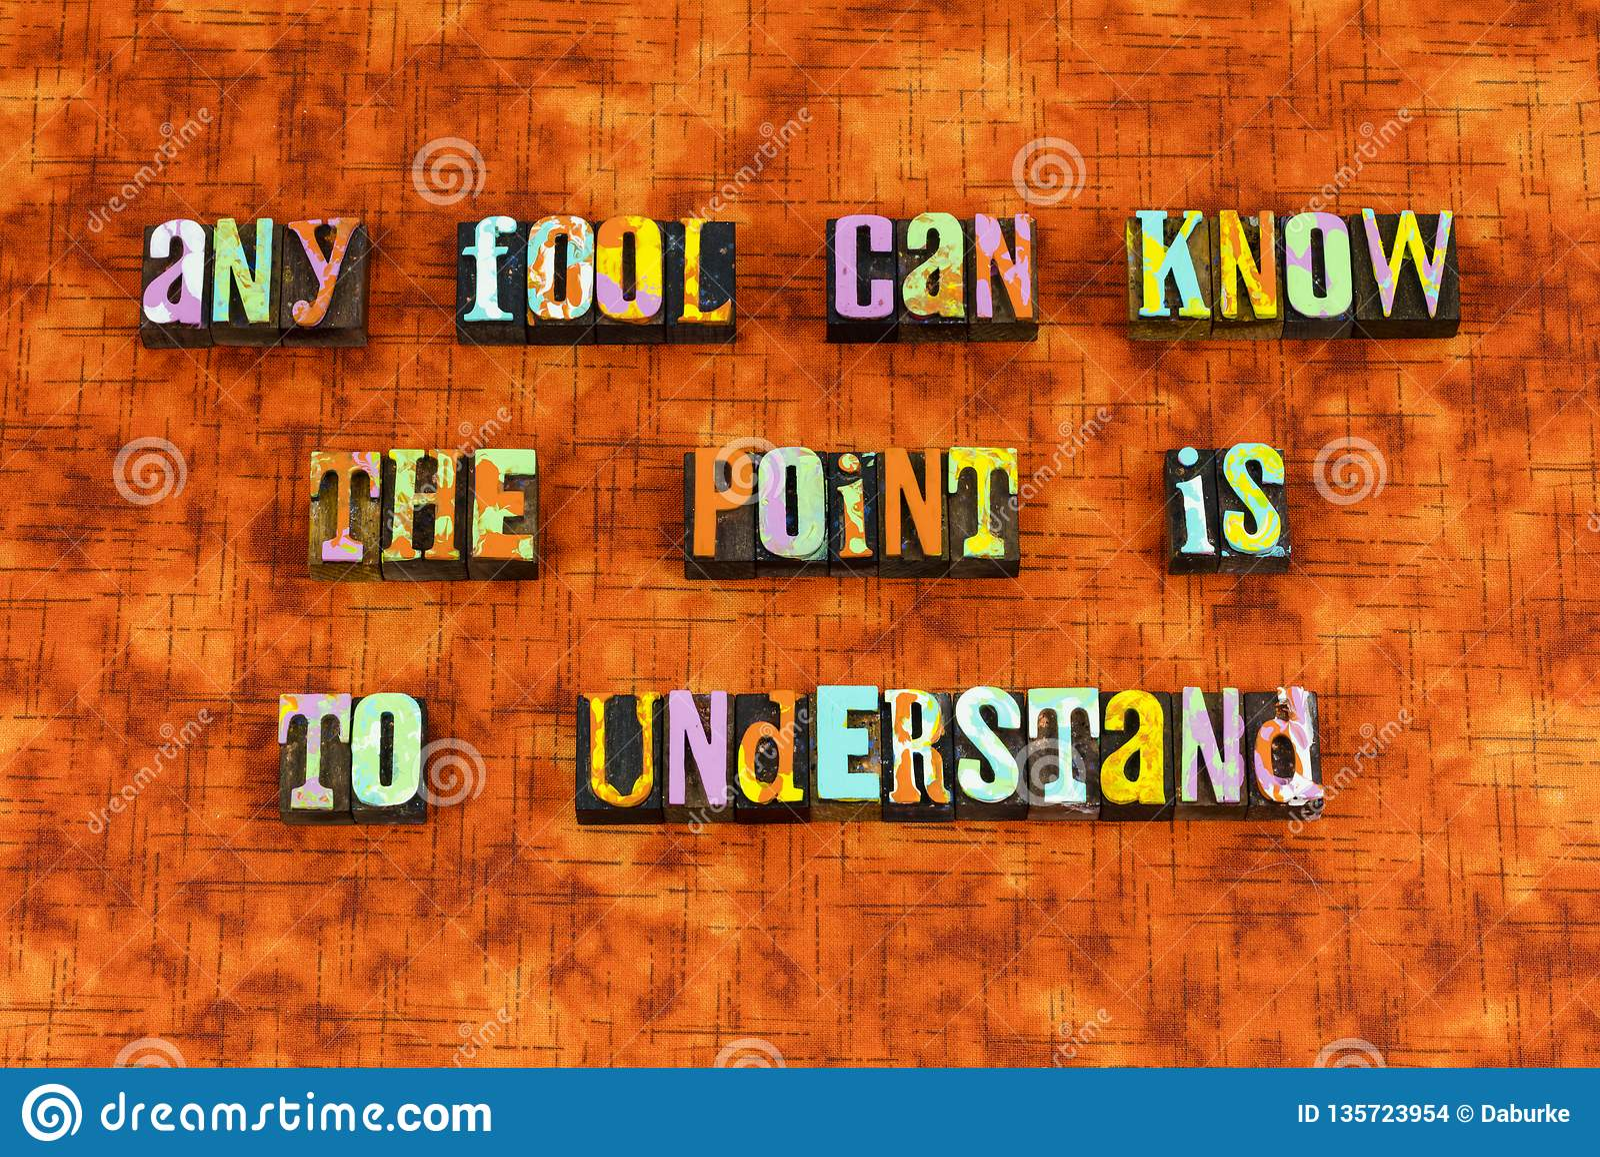 Премудрость дурака мудрая понять учит letterpress